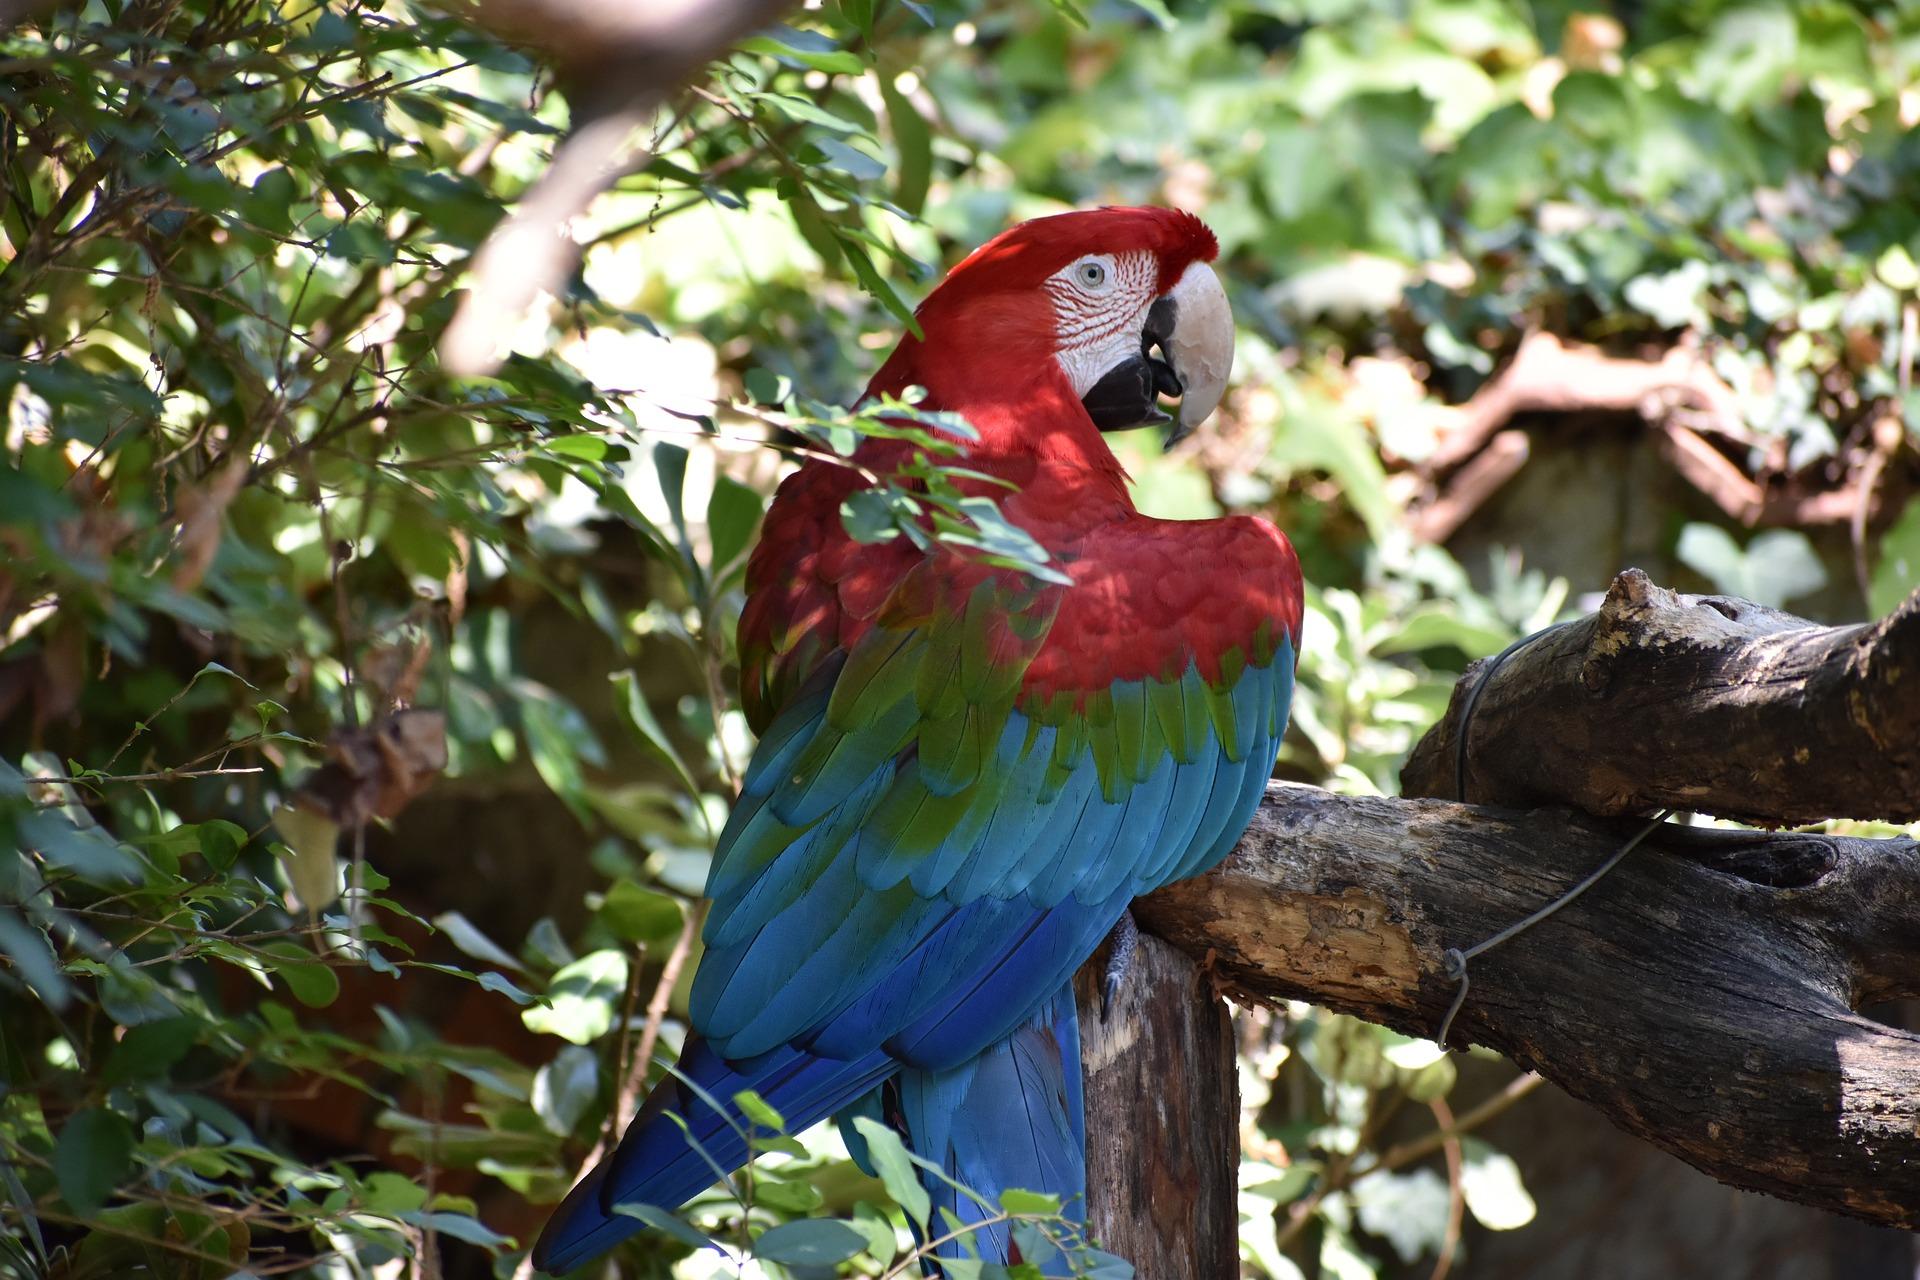 Agriturismo-la-gioconda-Vinci-Firenze-parrots 3601262 1920